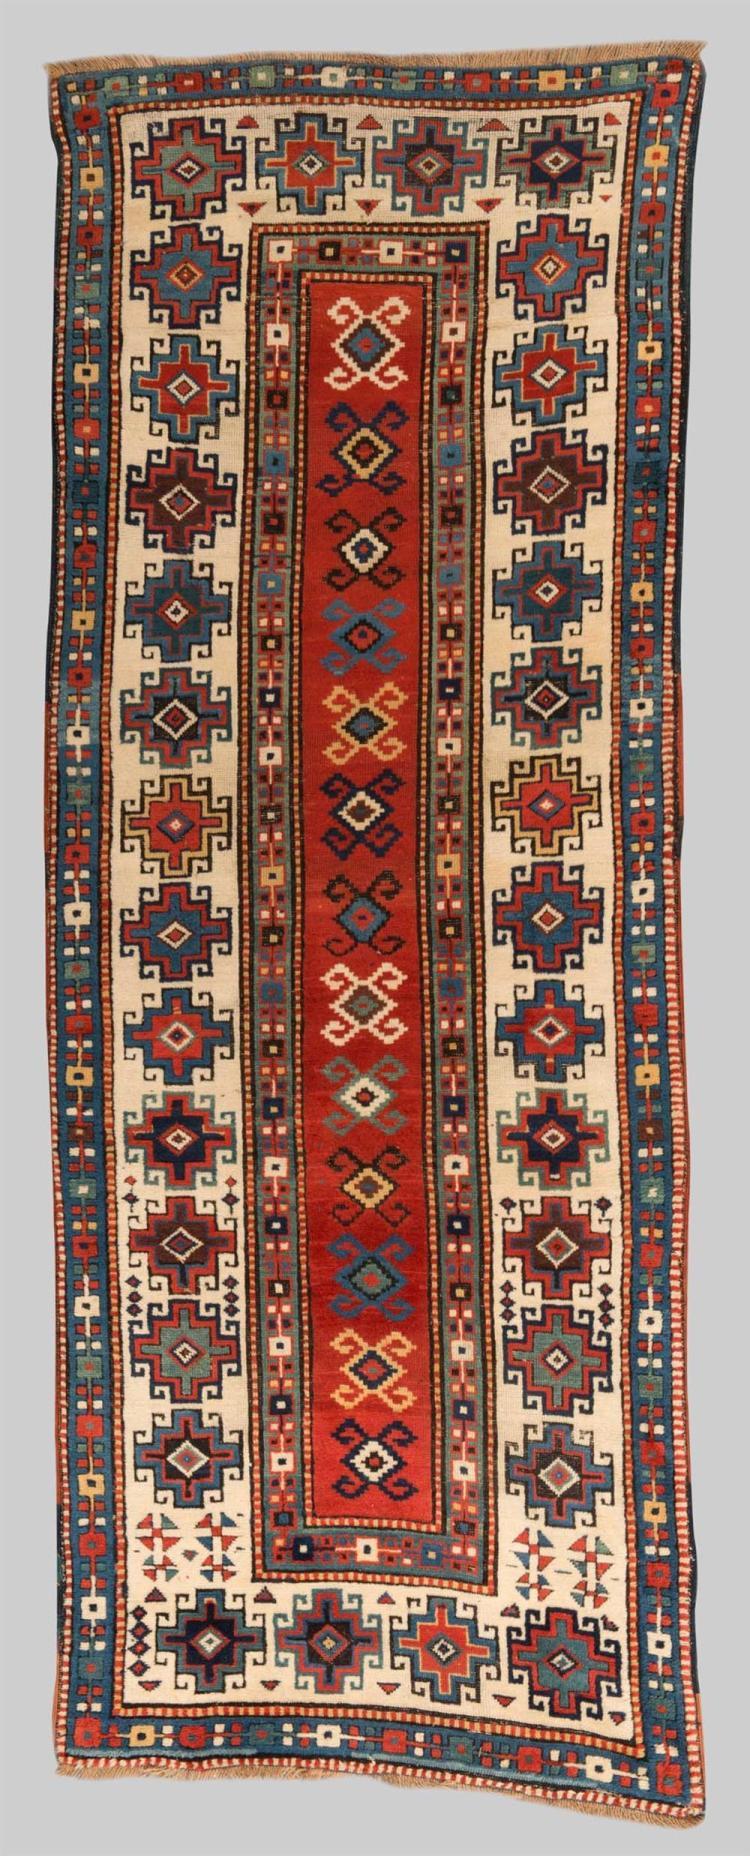 MOGHAN RUG, Caucasus, second half 19th century; 8 ft. 7 in. x 3 ft. 2 1/2 in.